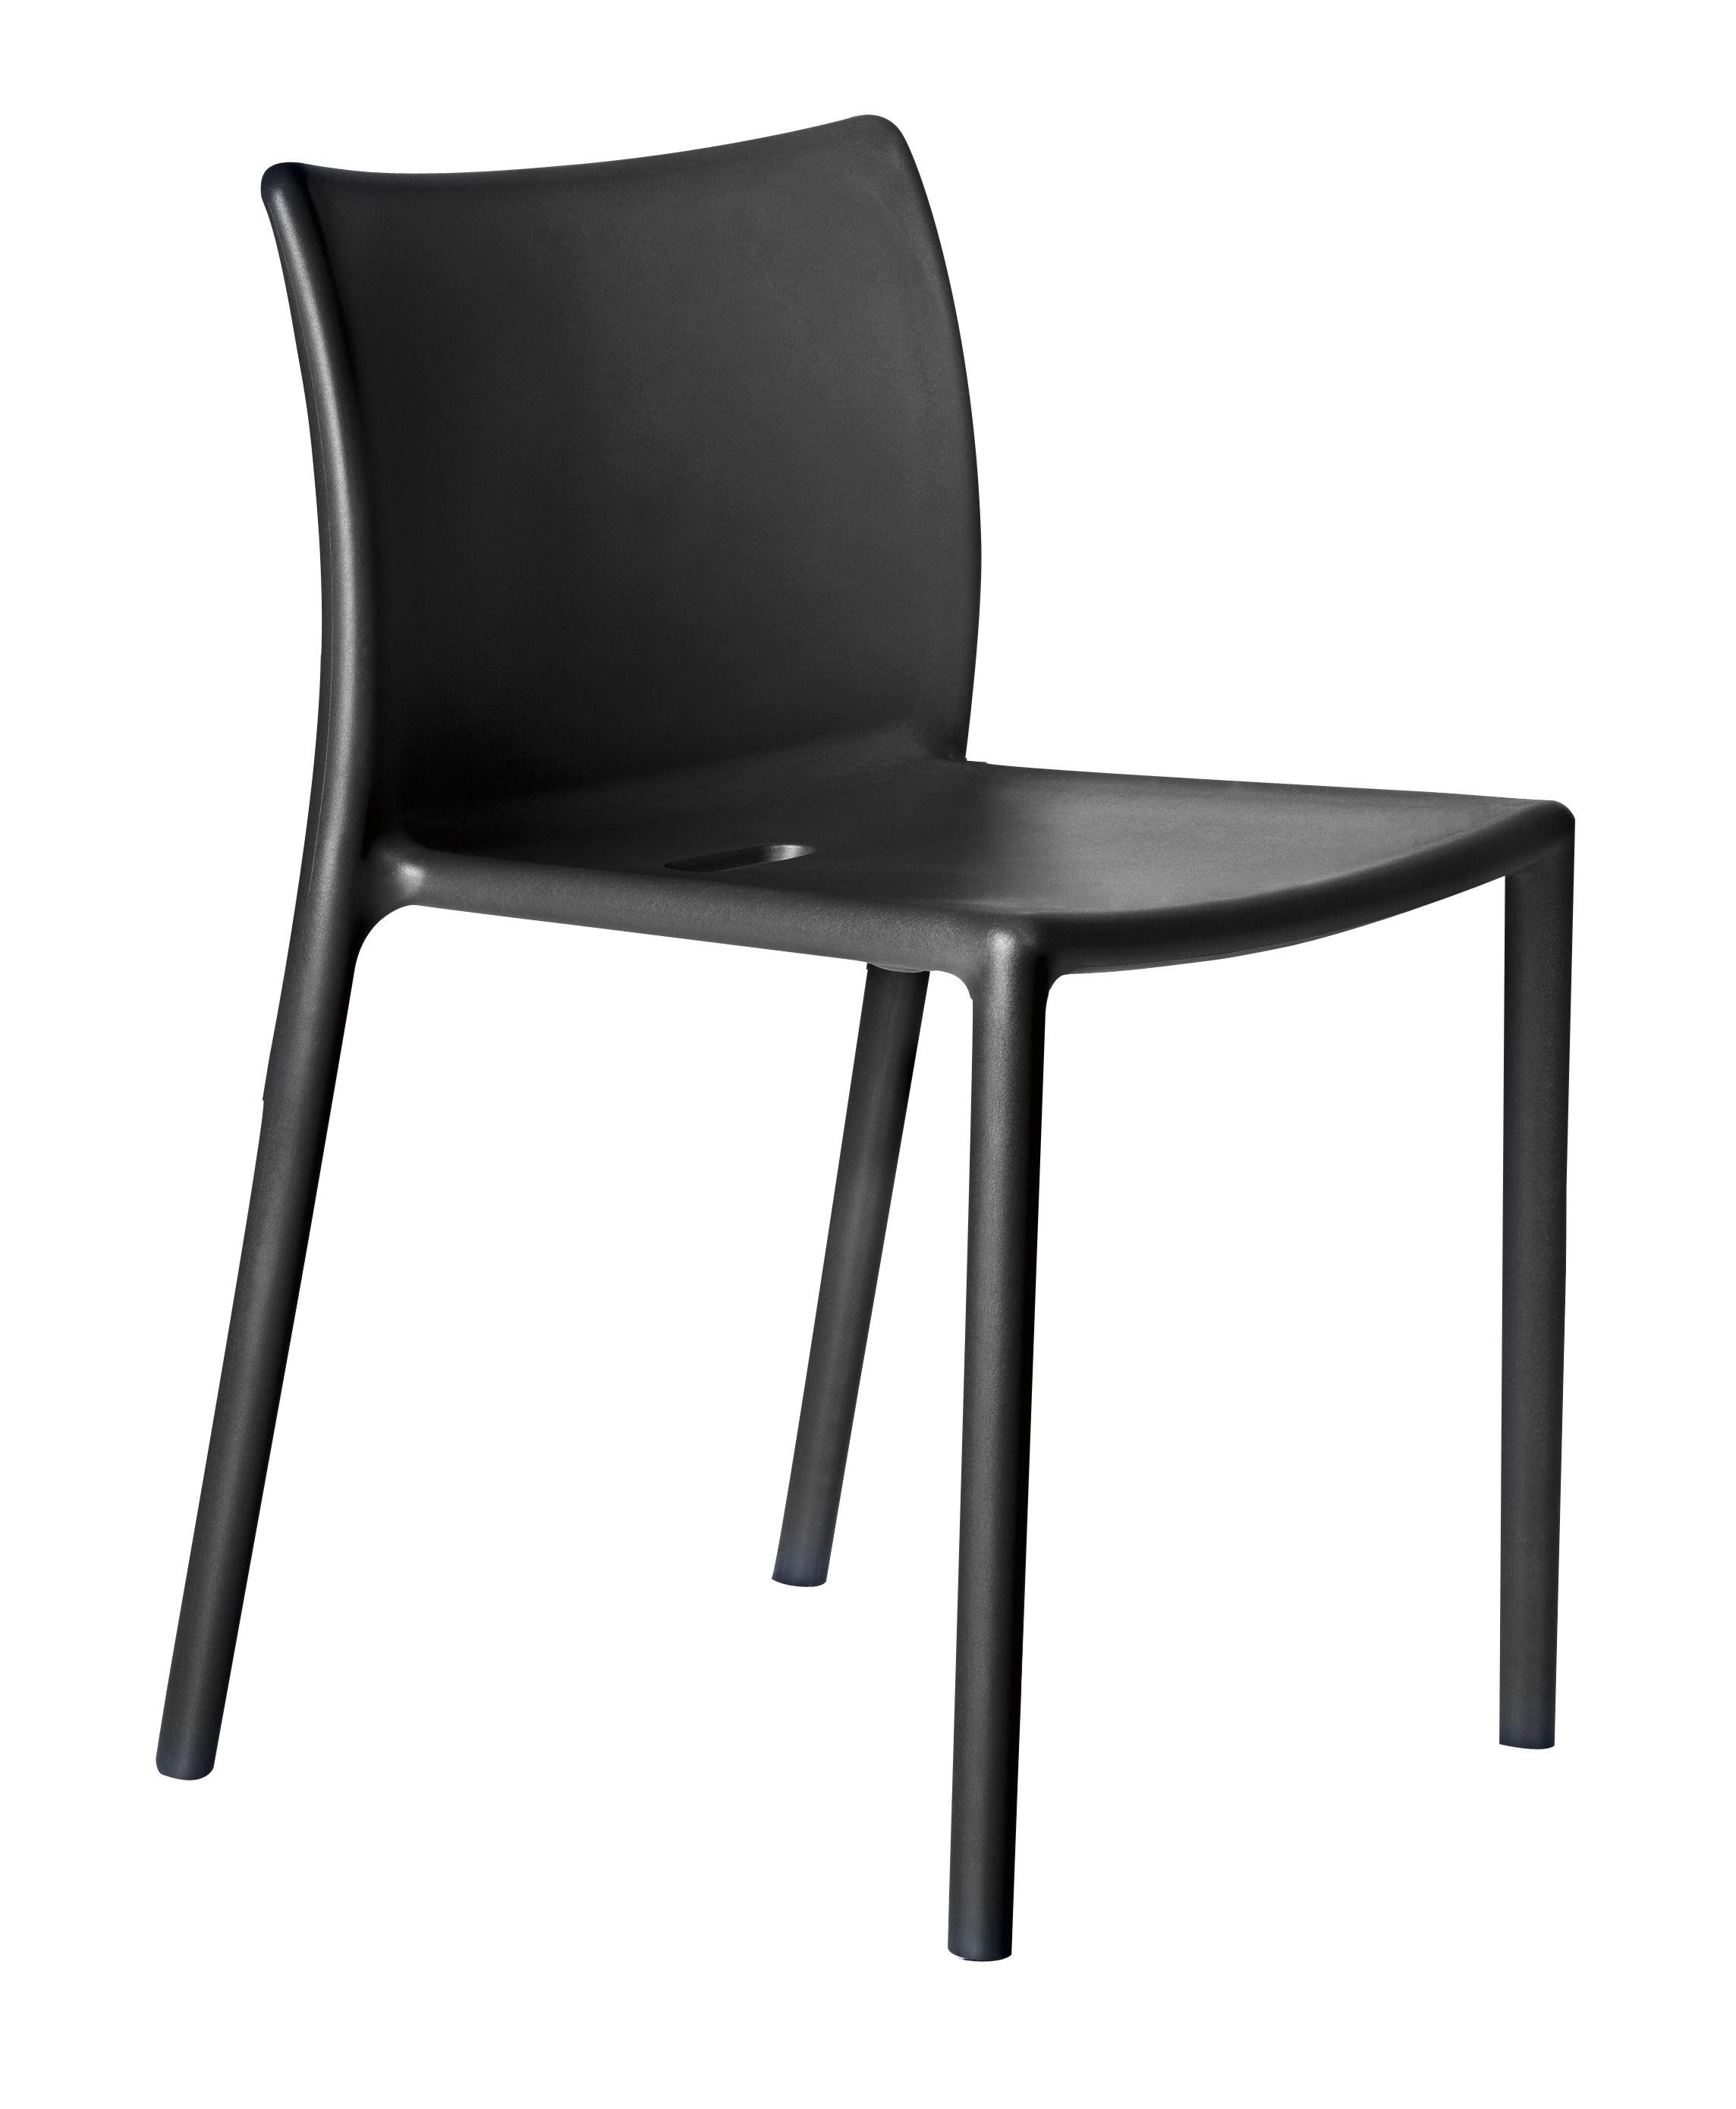 Möbel - Stühle  - Air-chair Stapelbarer Stuhl - Magis - Schwarz - Polypropylen